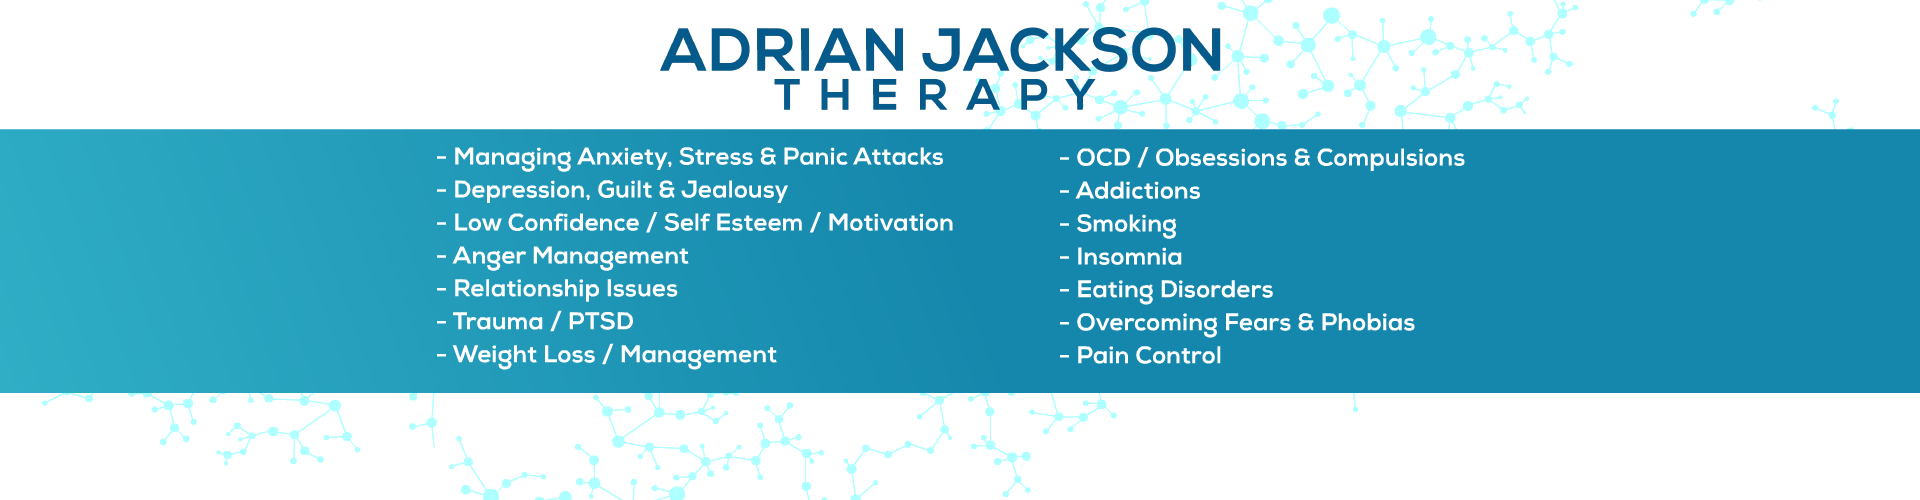 Adrian Jackson Therapy | Hypnotherapist in Harrow|Hillingdon|Hertfordshire|Hayes|Ruislip|Uxbridge|Northwood|Pinner